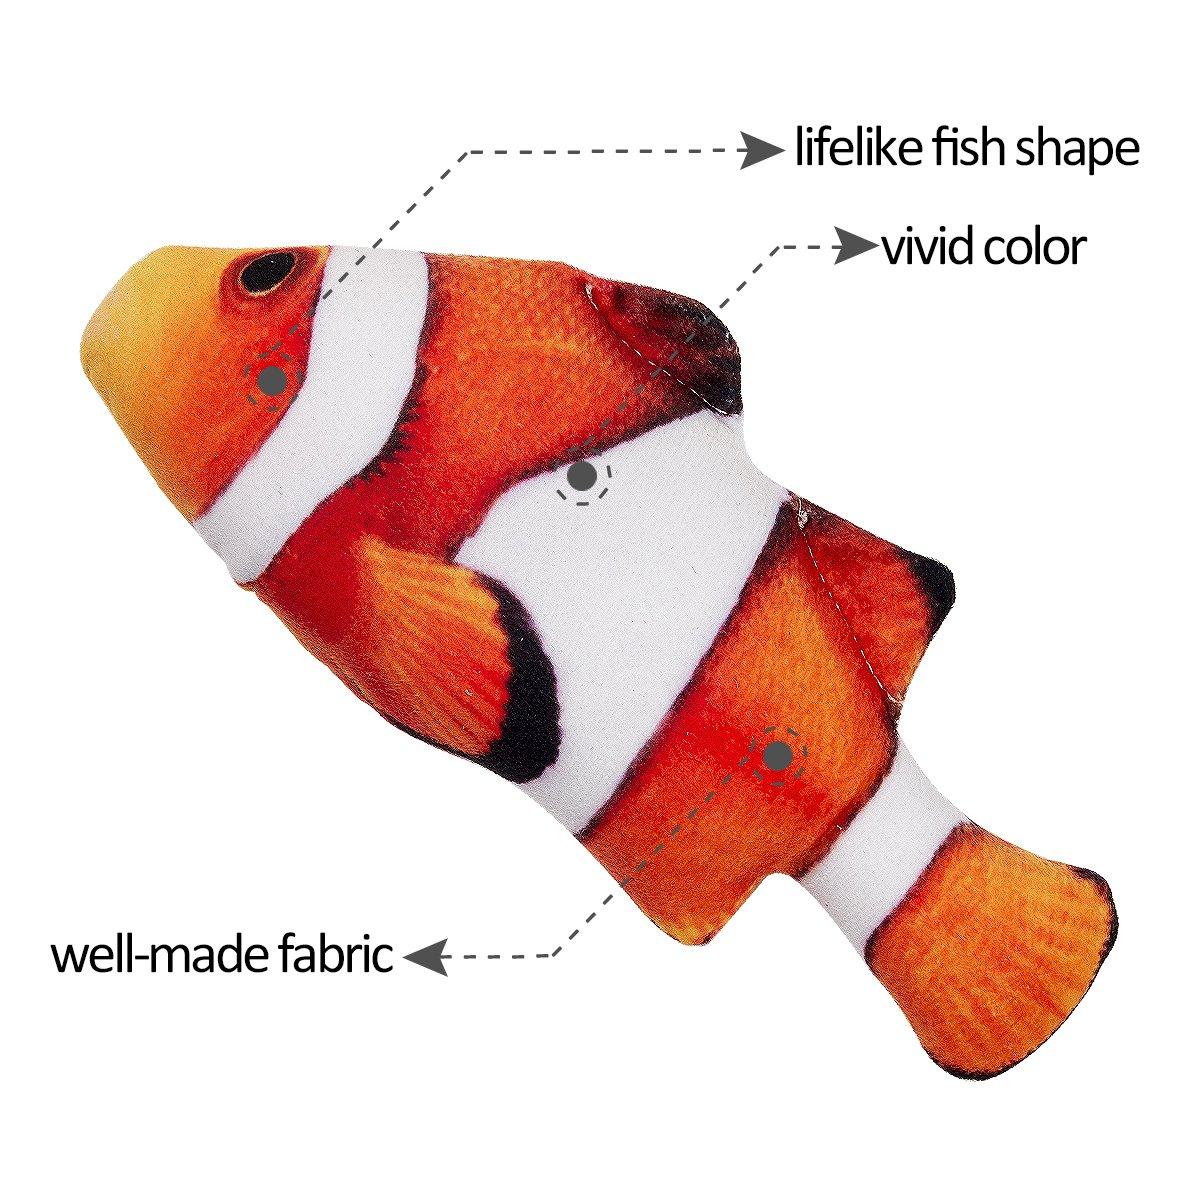 Amazon.com : MEWTOGO Cat toy Catnip Fluffy Fish Kitty Interactive ...